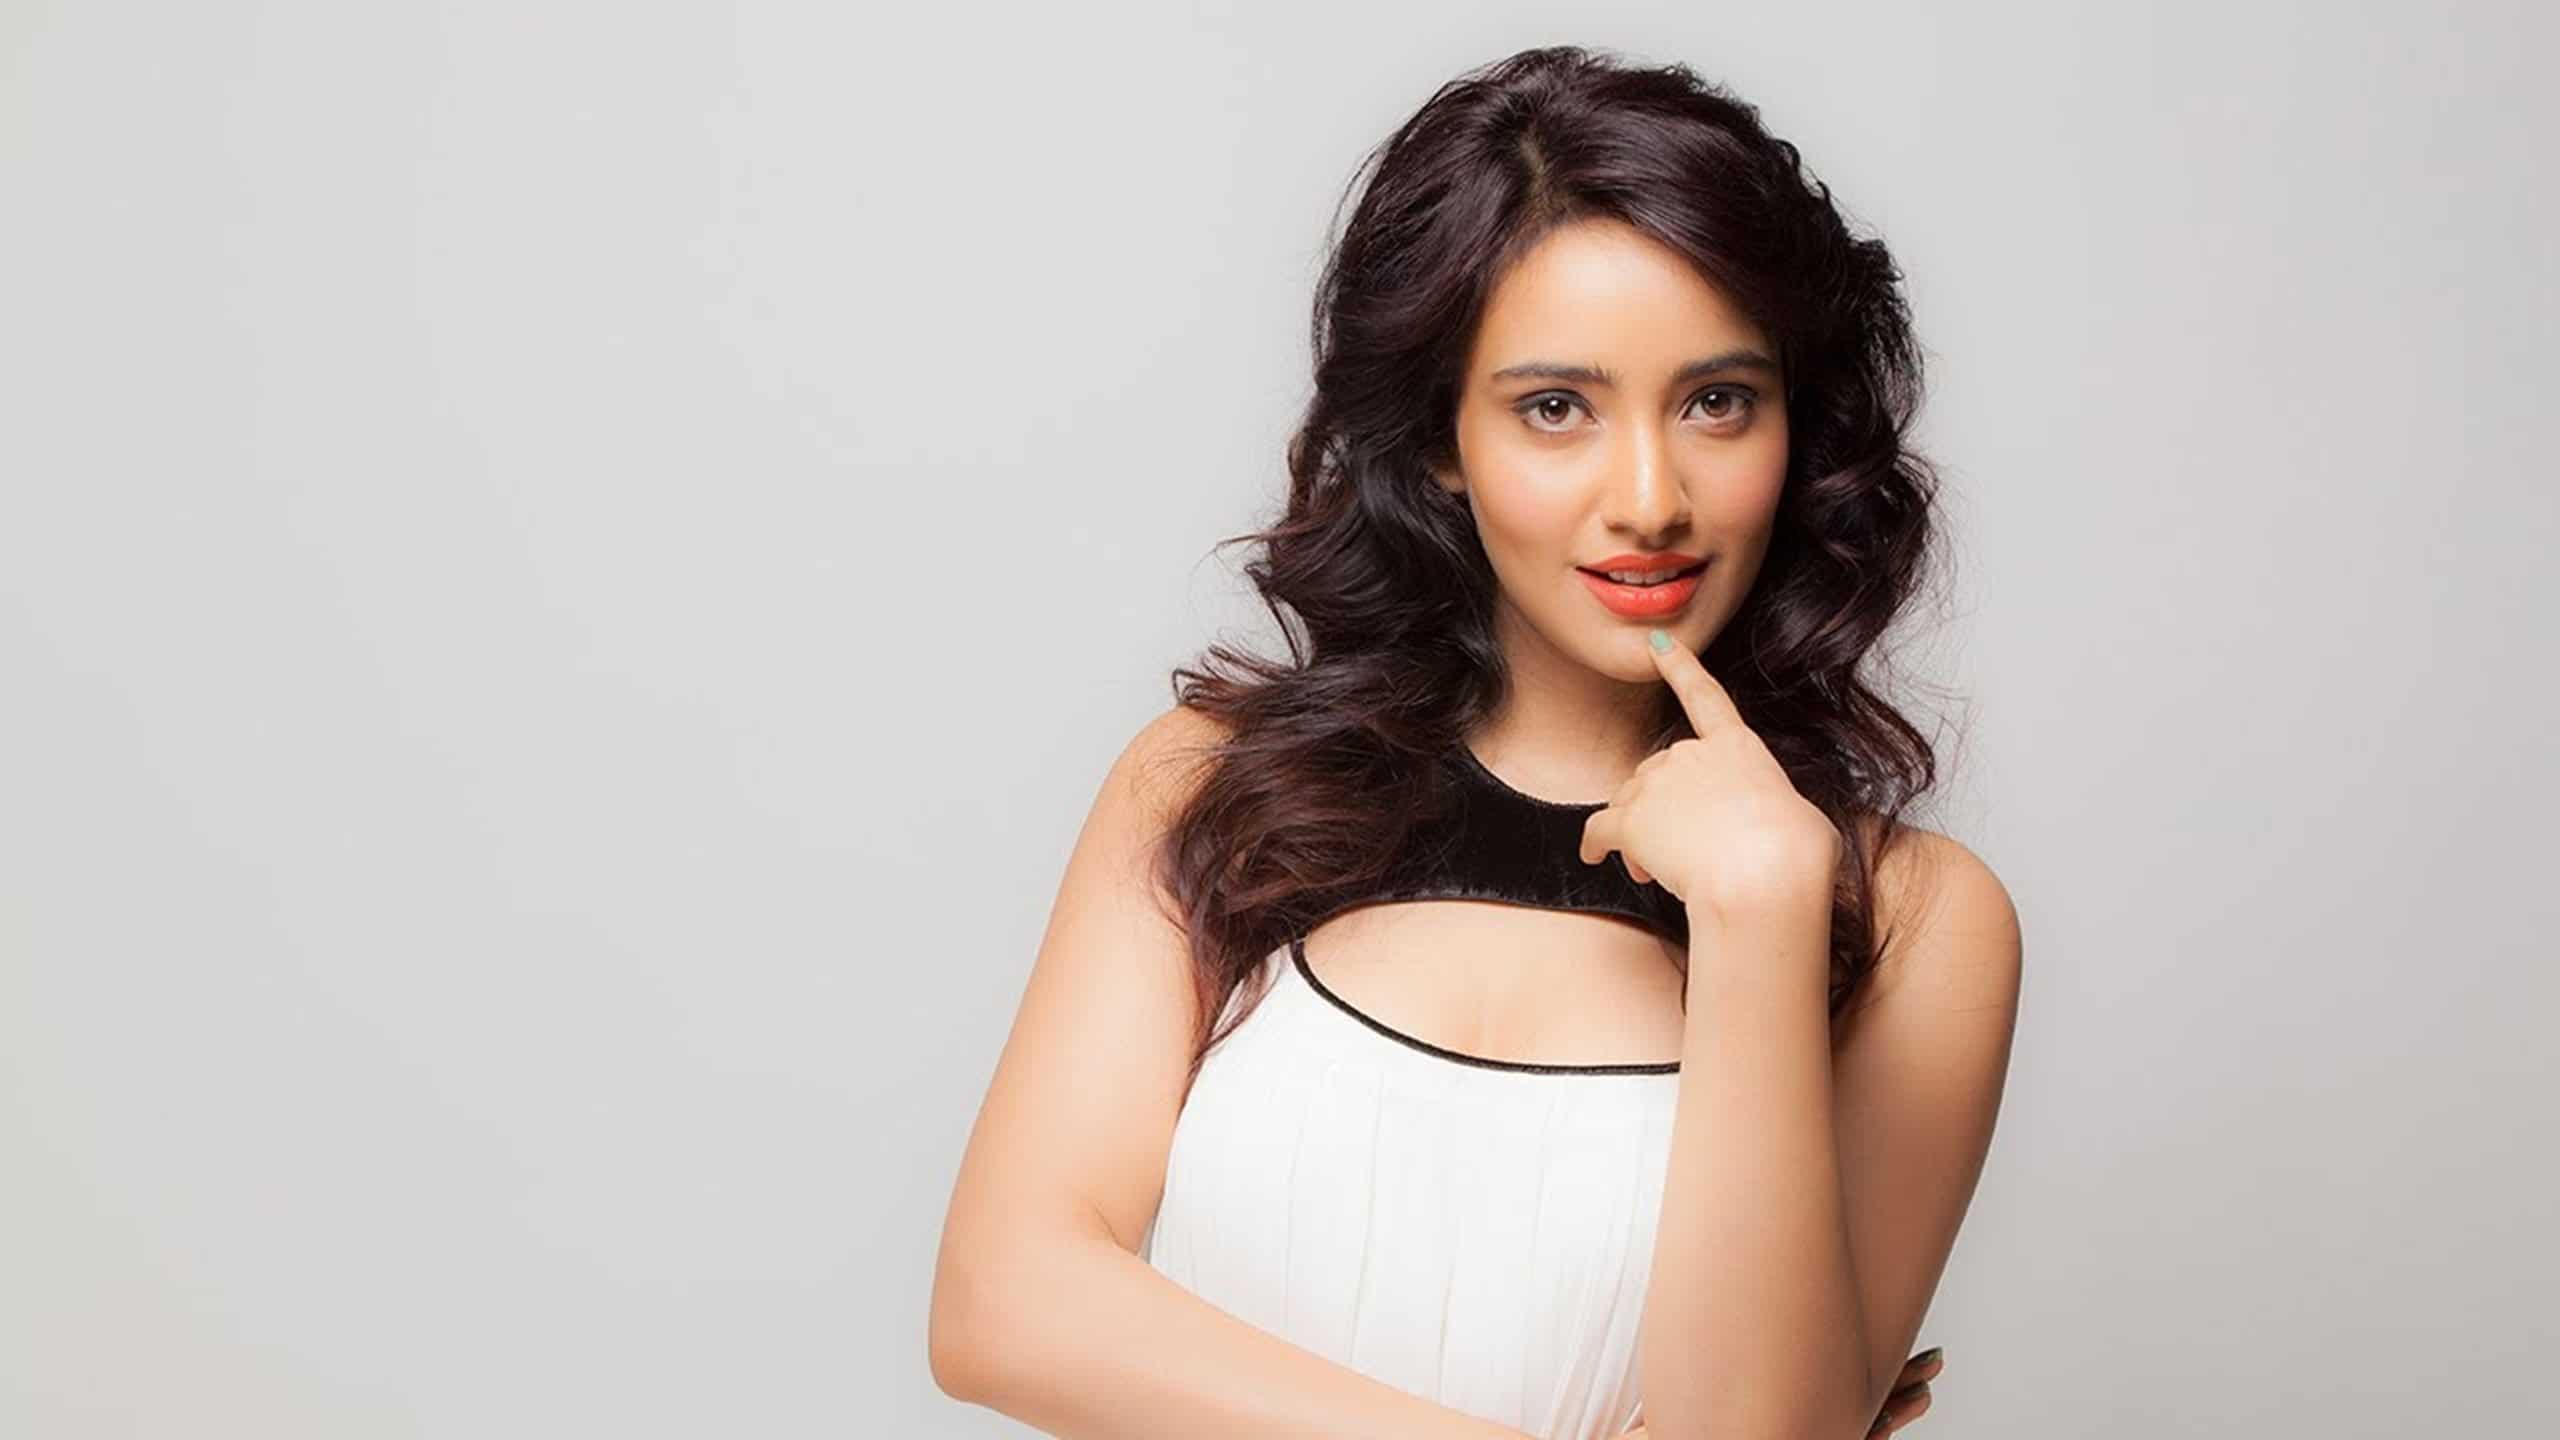 Beautiful-Actress-Neha-Sharma-Hd-Wallpaper